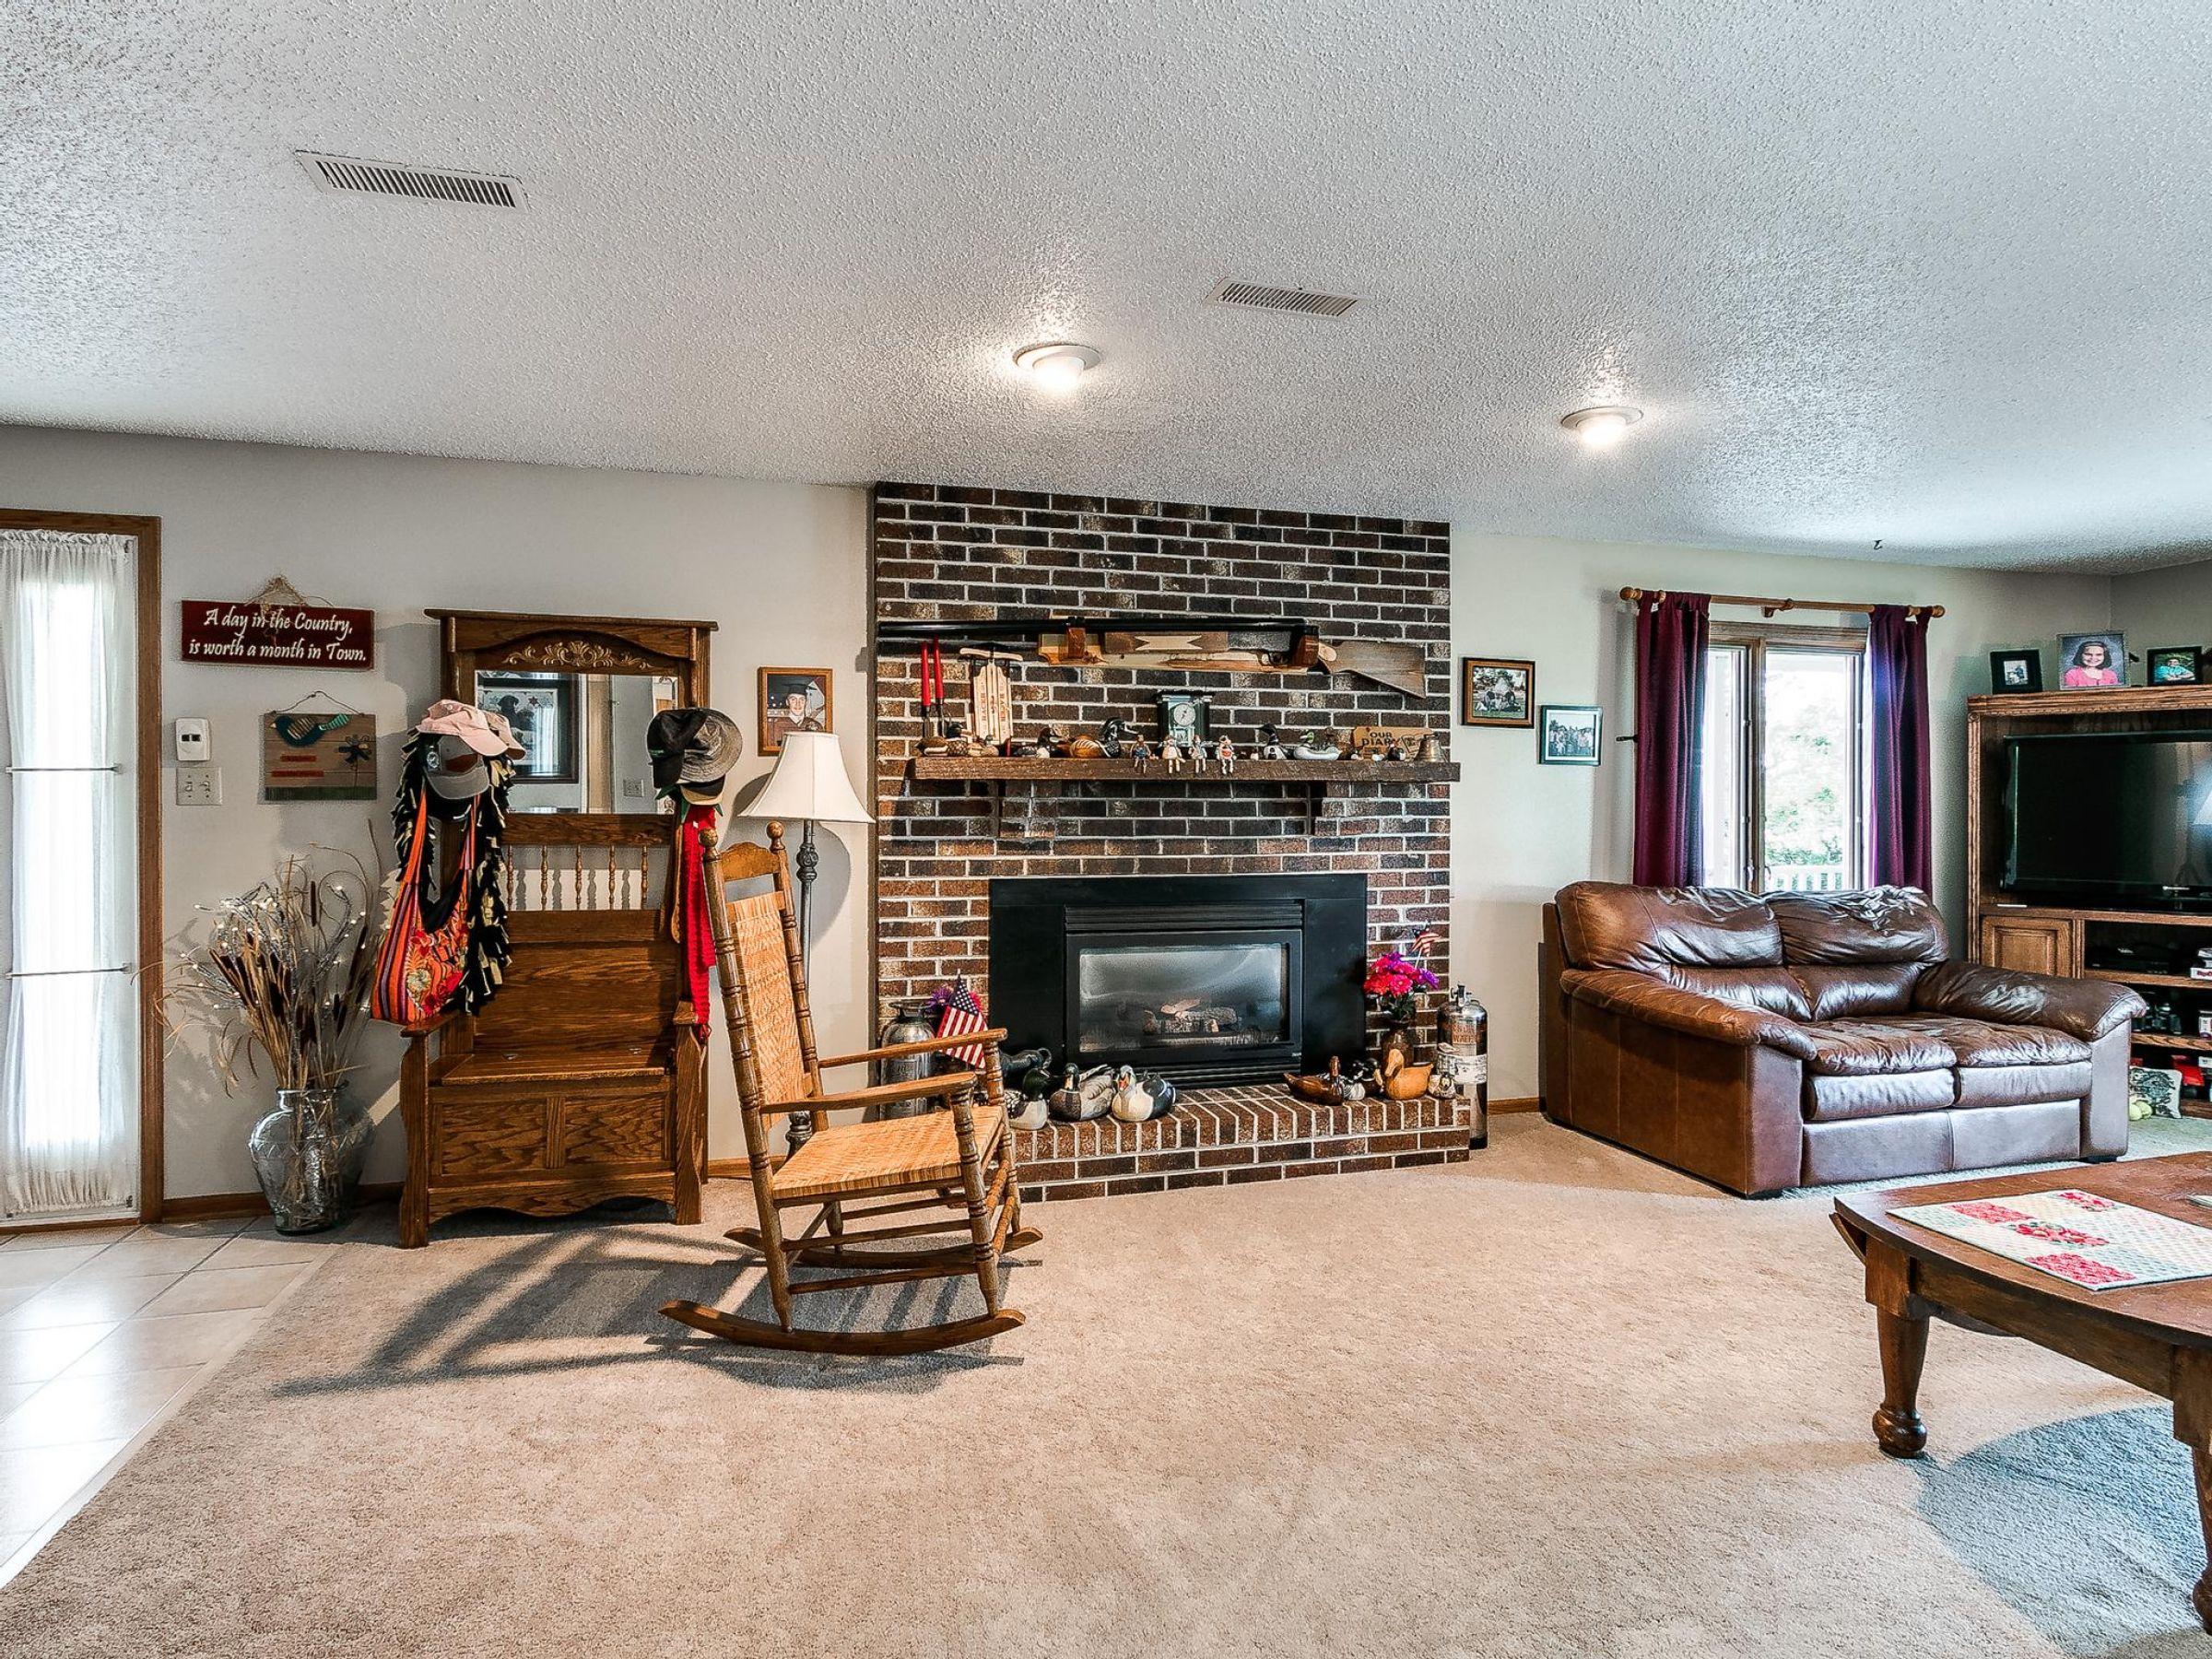 residential-warren-county-iowa-3-acres-listing-number-15593-4-2021-06-18-155240.jpg